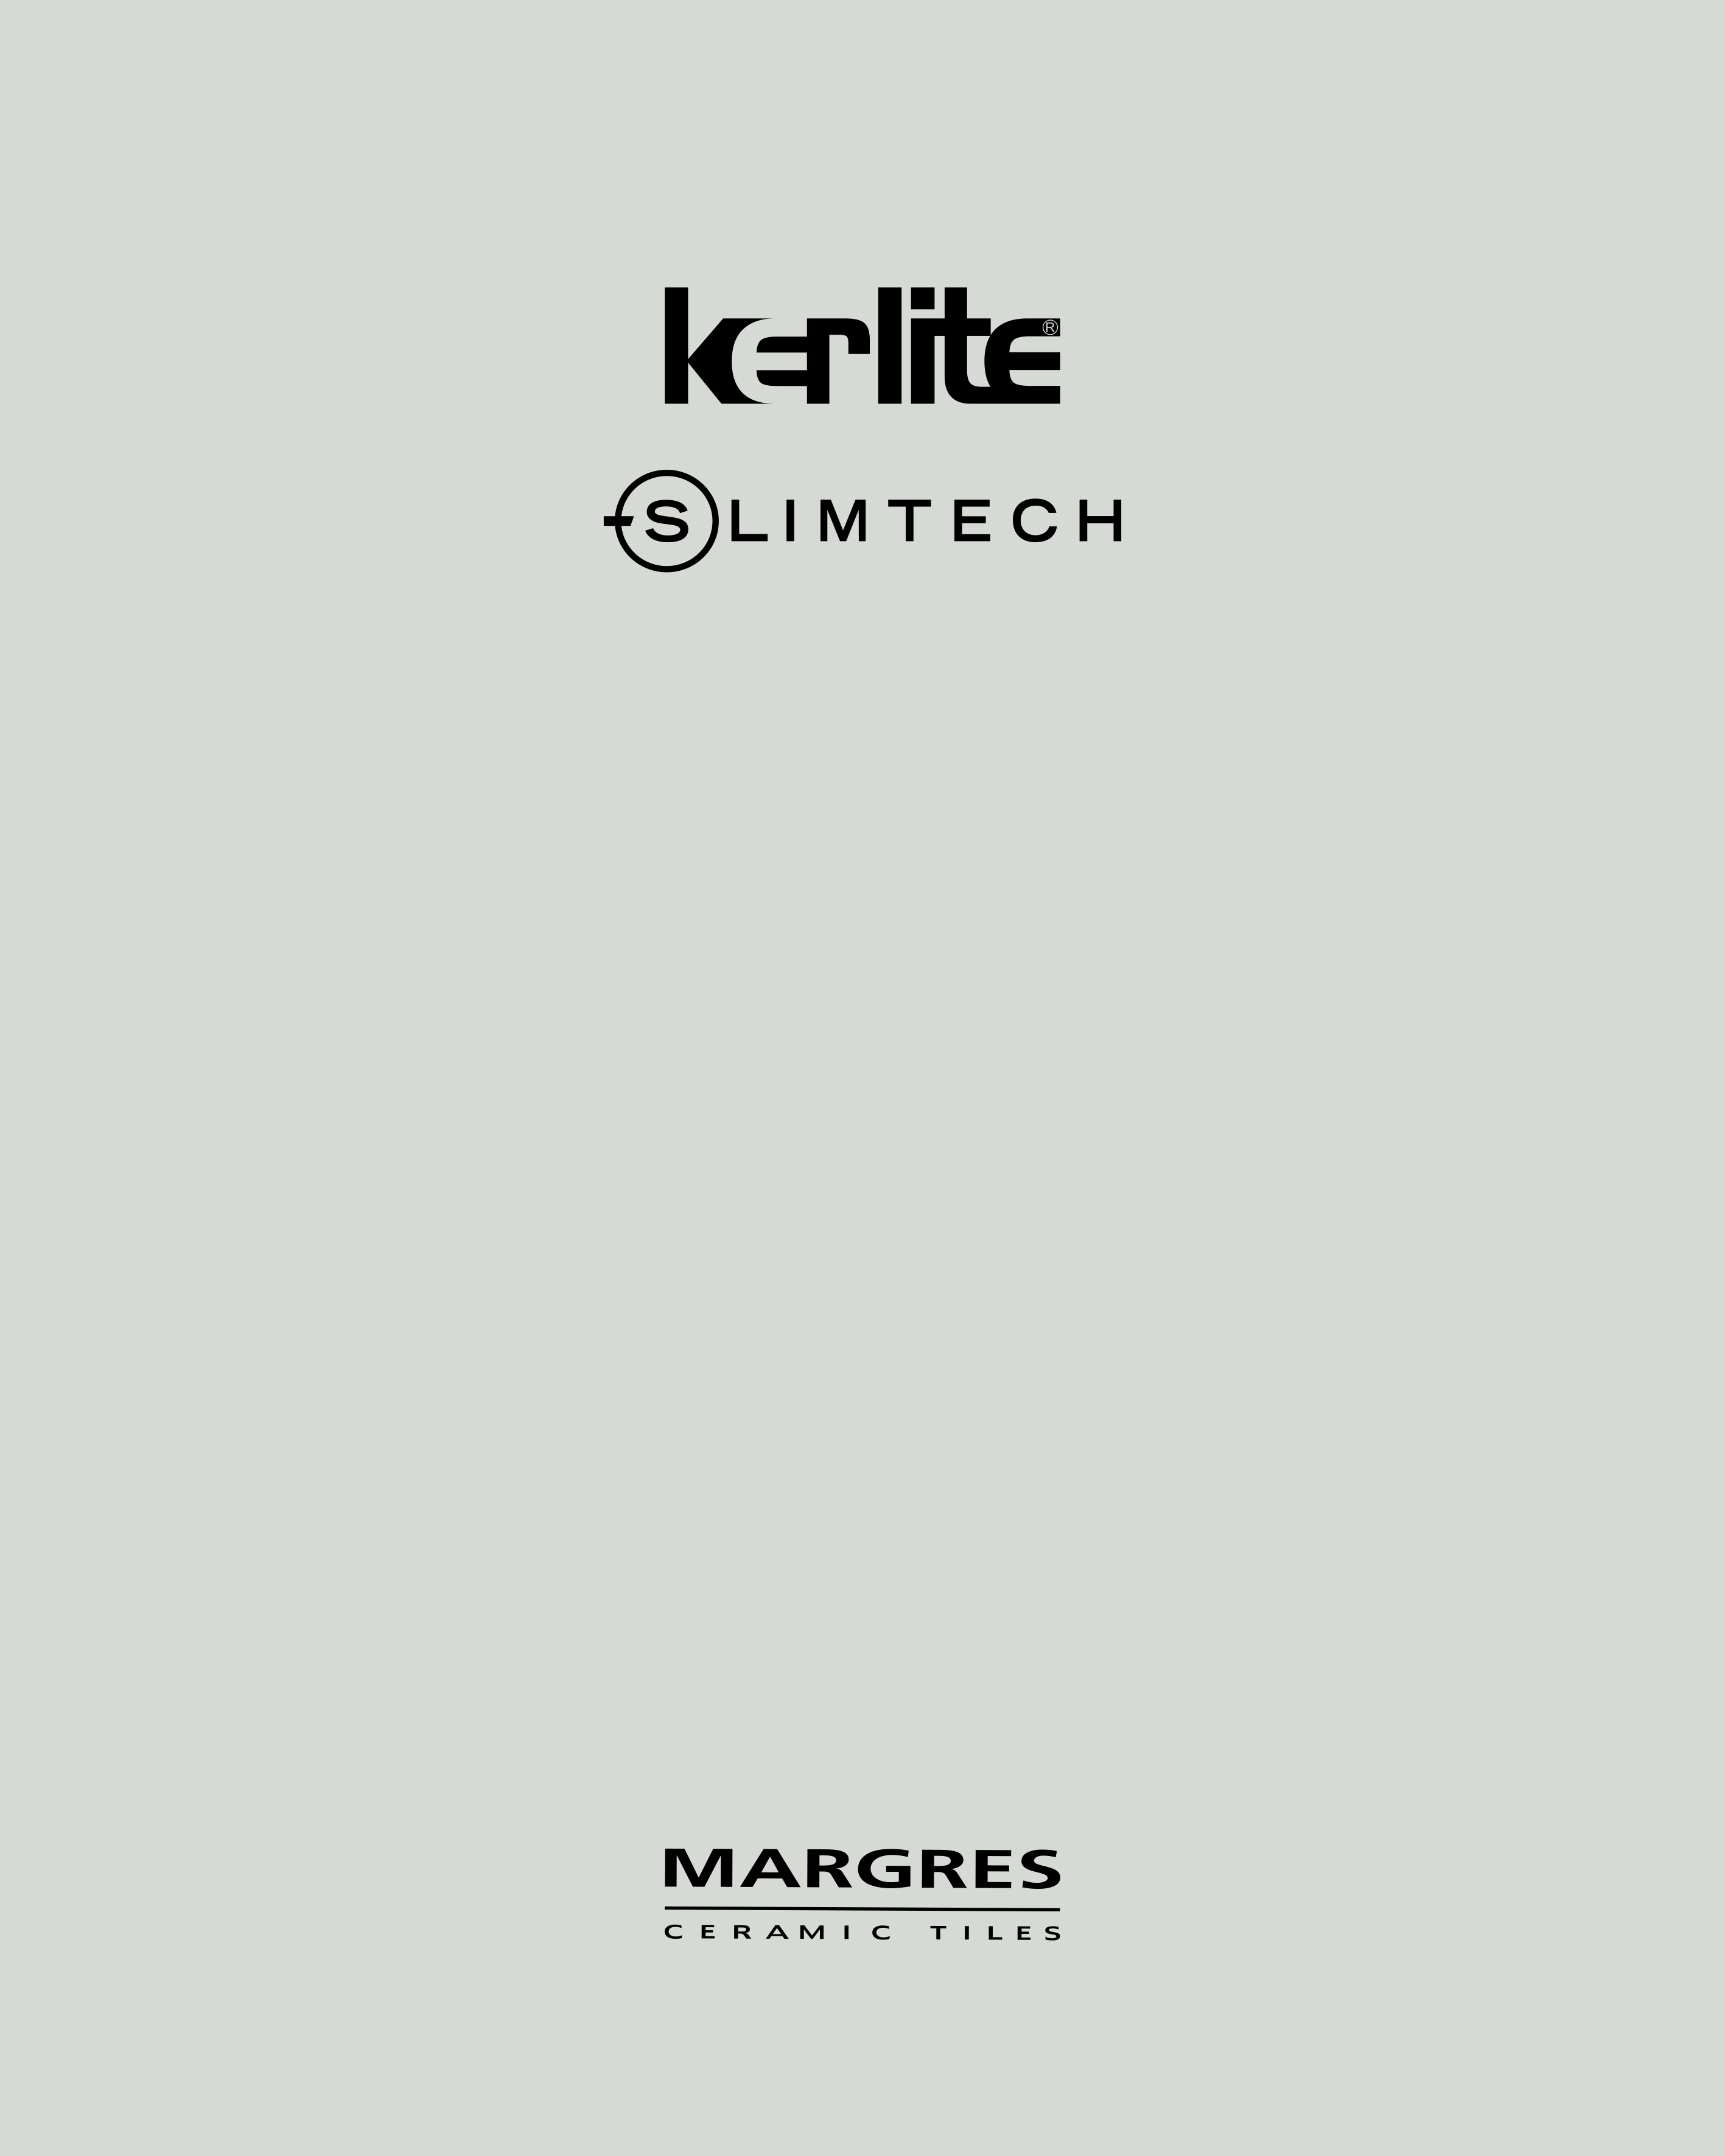 Catálogo Kerlite